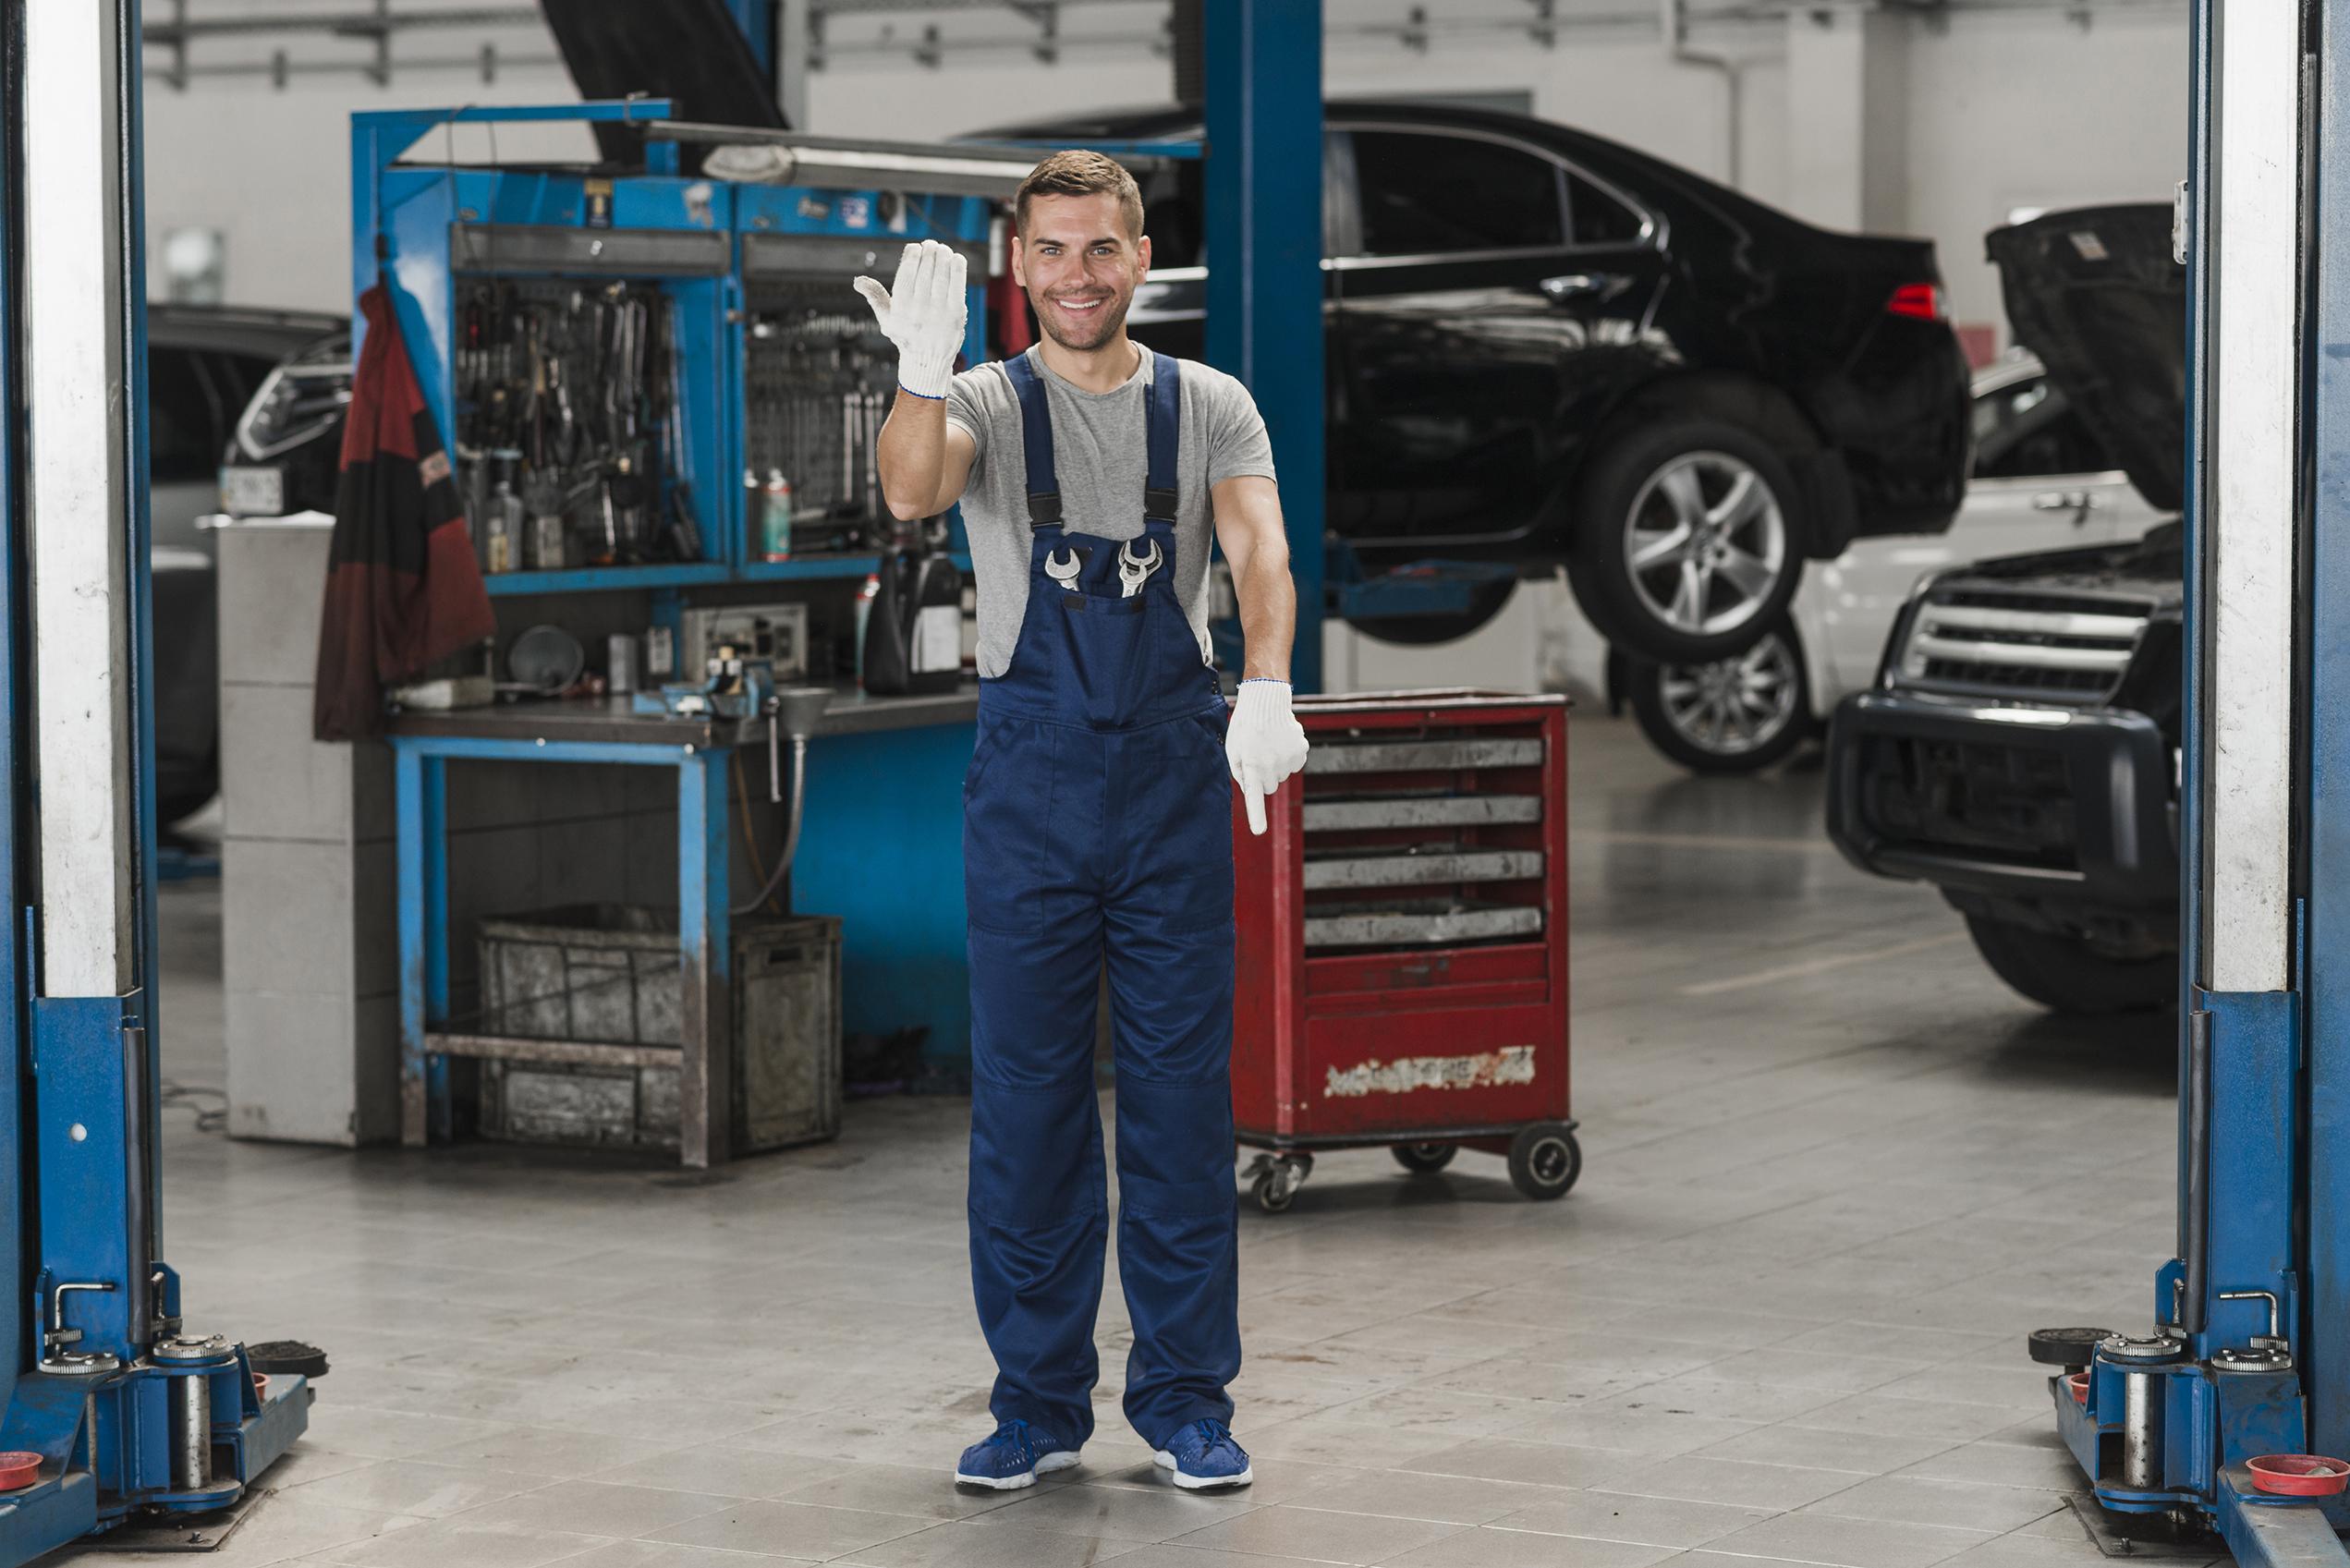 Foto de negocios creado por freepik - www.freepik.es